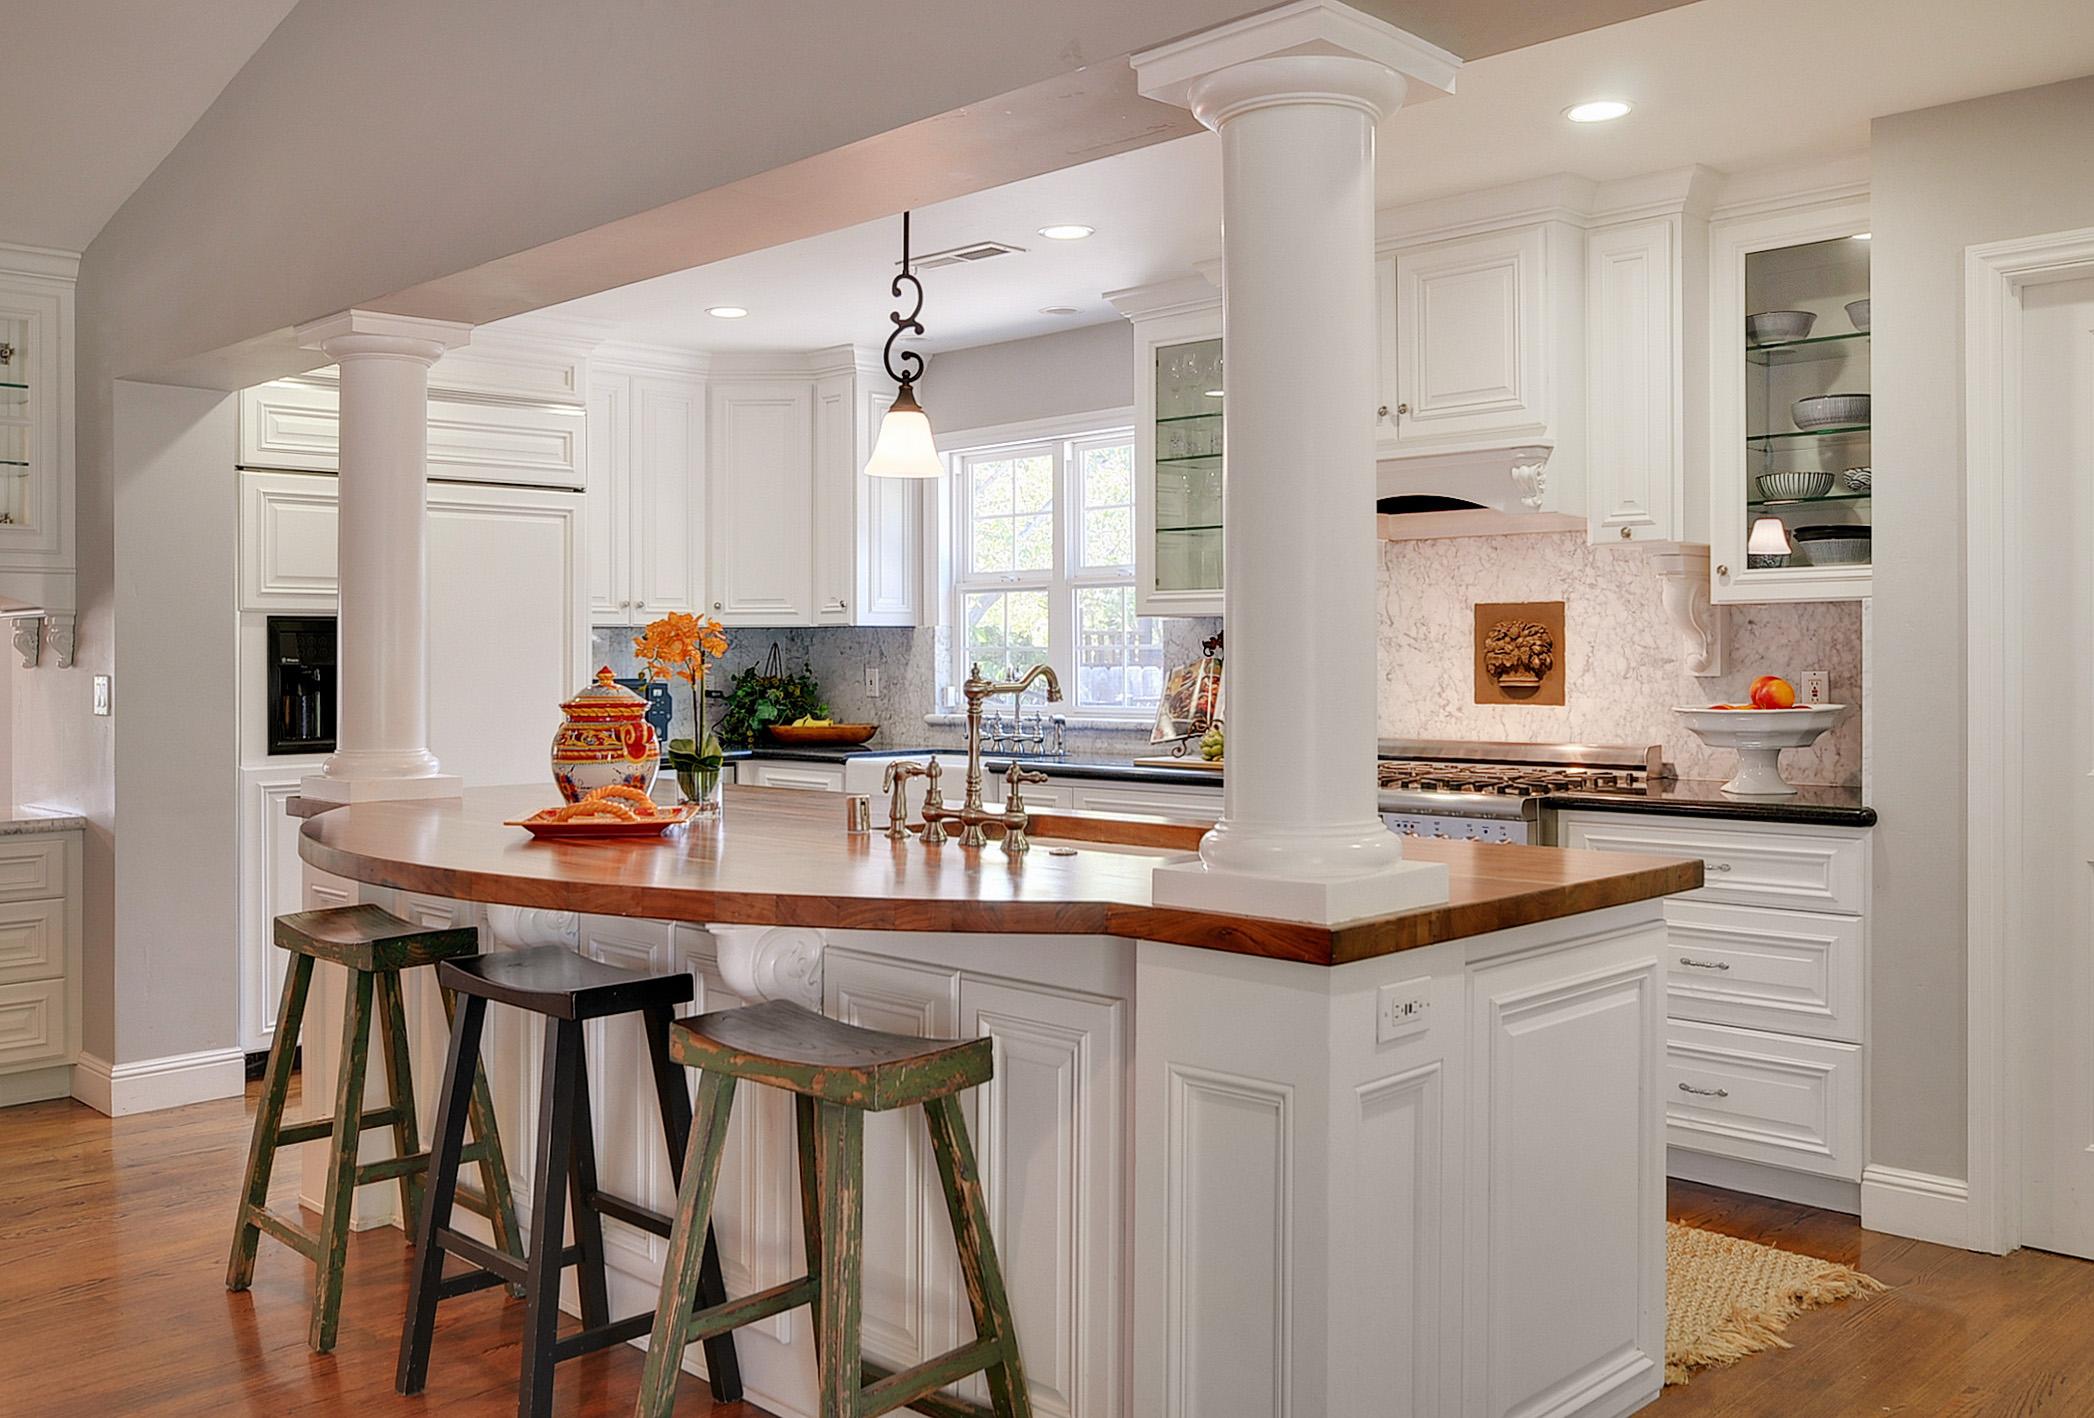 Kitchen-1314692236-O.jpg